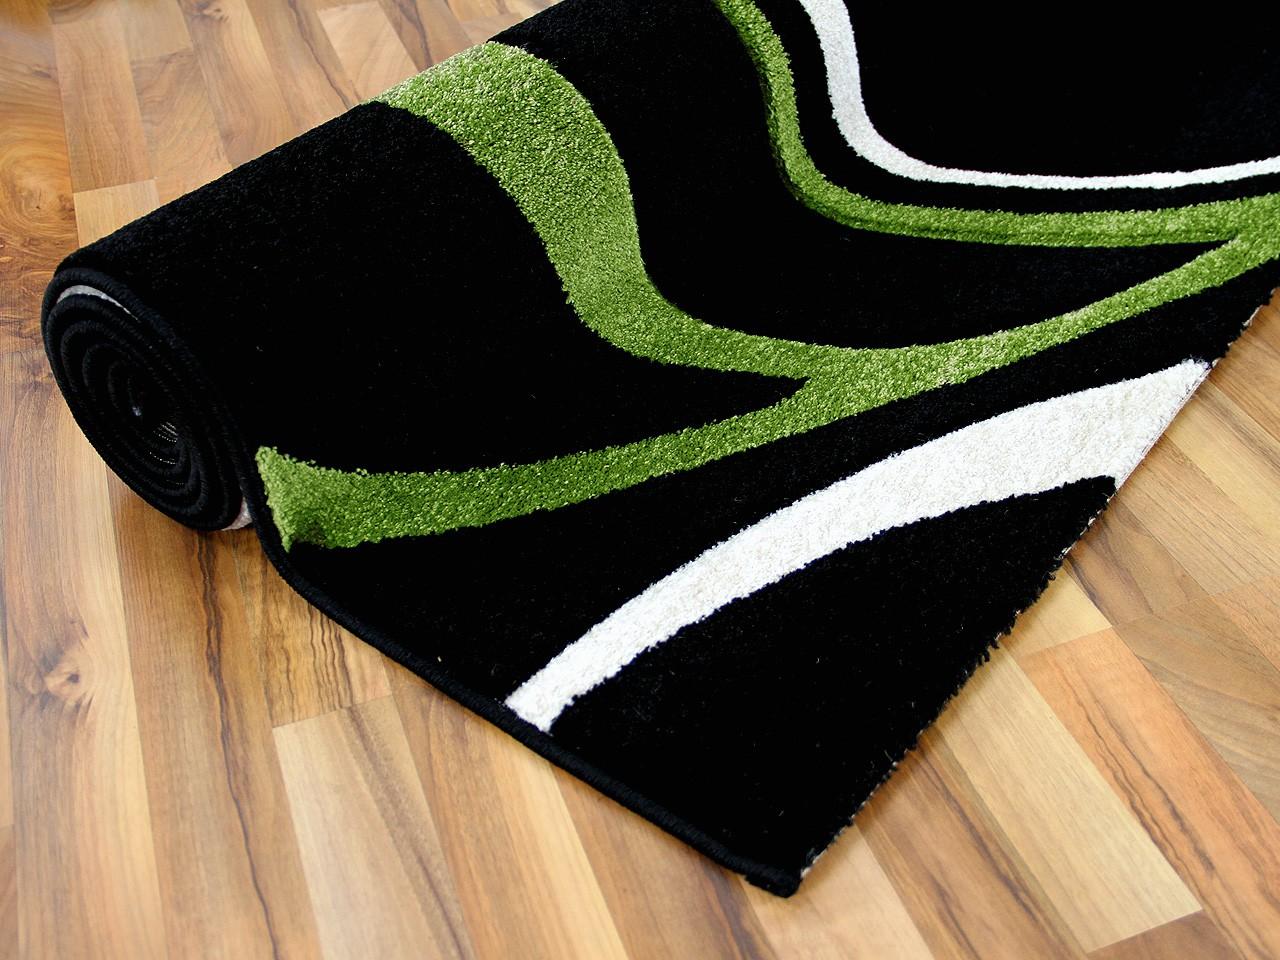 designer teppich maui schwarz gr n style teppiche designerteppiche maui teppiche. Black Bedroom Furniture Sets. Home Design Ideas